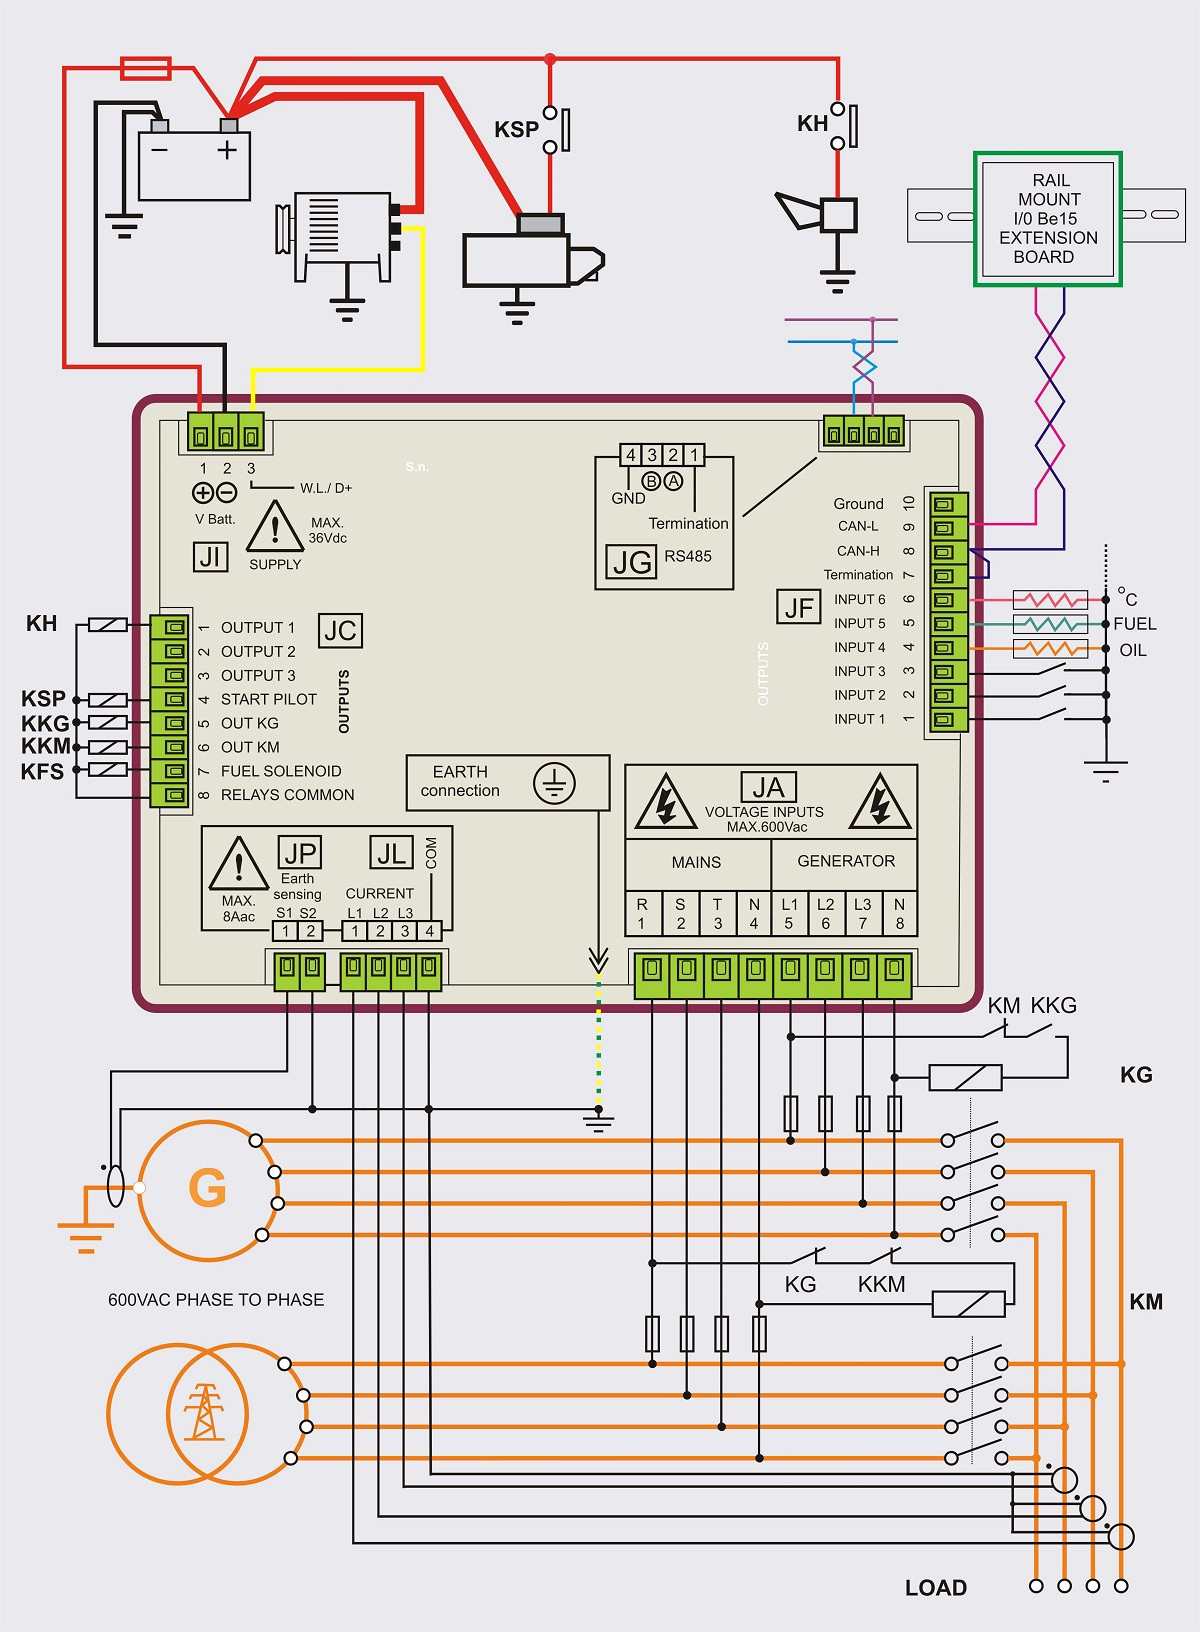 generac manual transfer switch wiring diagram Download-Generac 100 Amp Automatic Transfer Switch Wiring Diagram 16 14-e